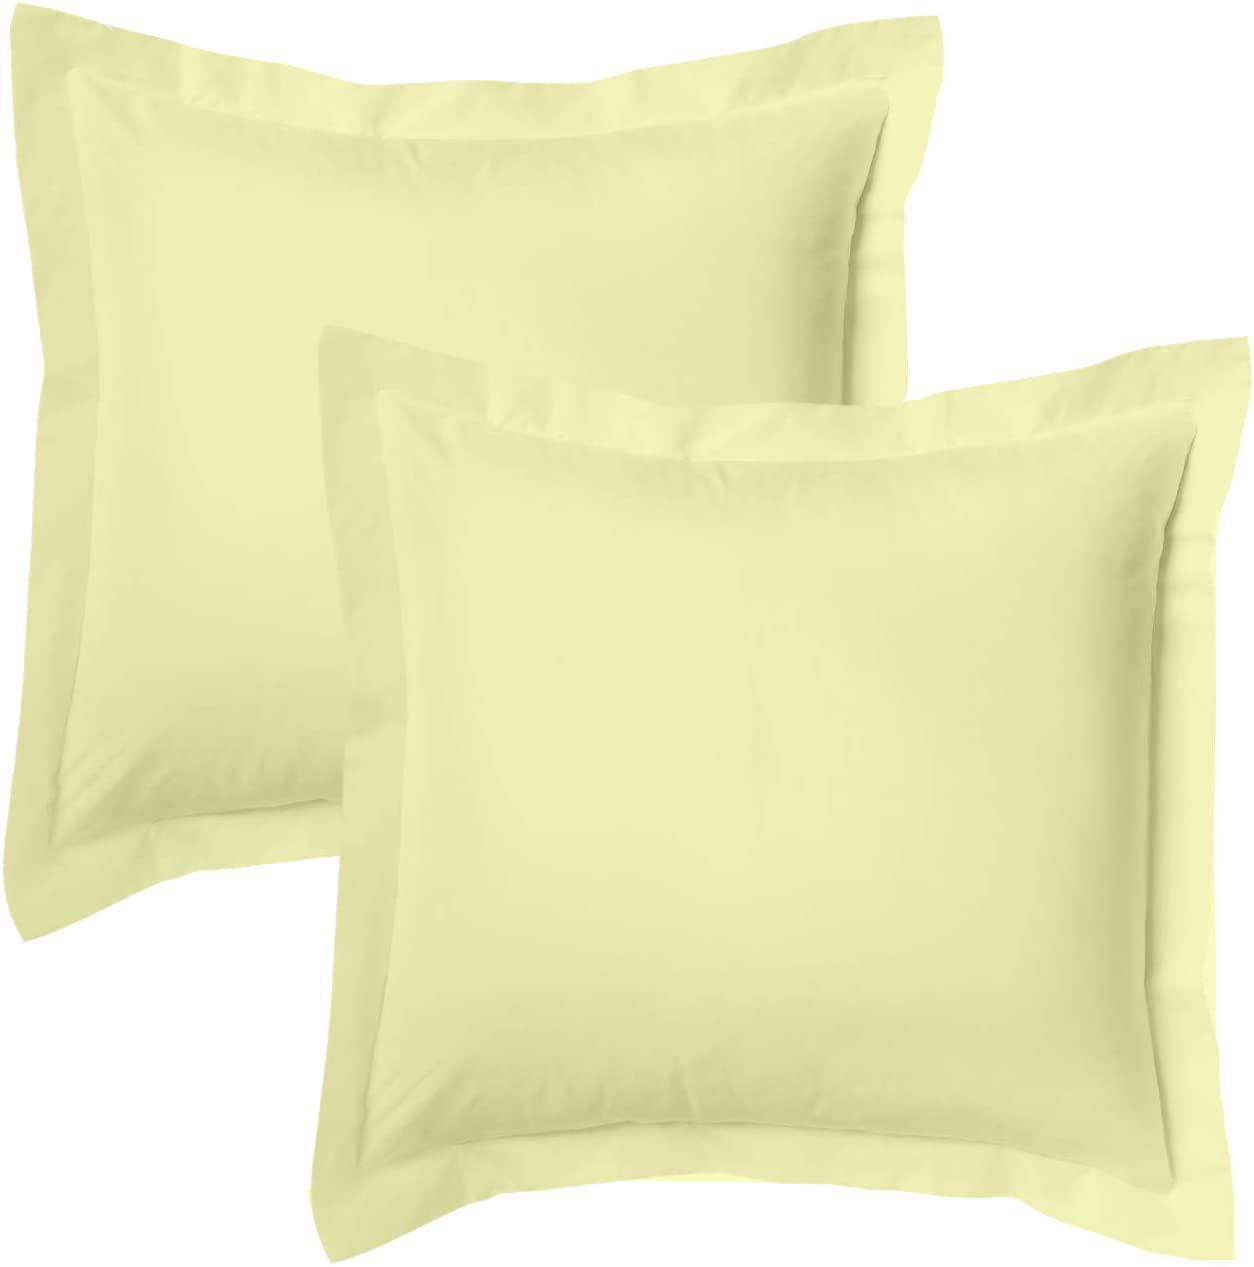 Premium Decorative | Body Pillow Sham Sized 20 by 56 | Envelop Closure | 100% Egyptian Cotton 600 TC, Ivory Solid Set of 1